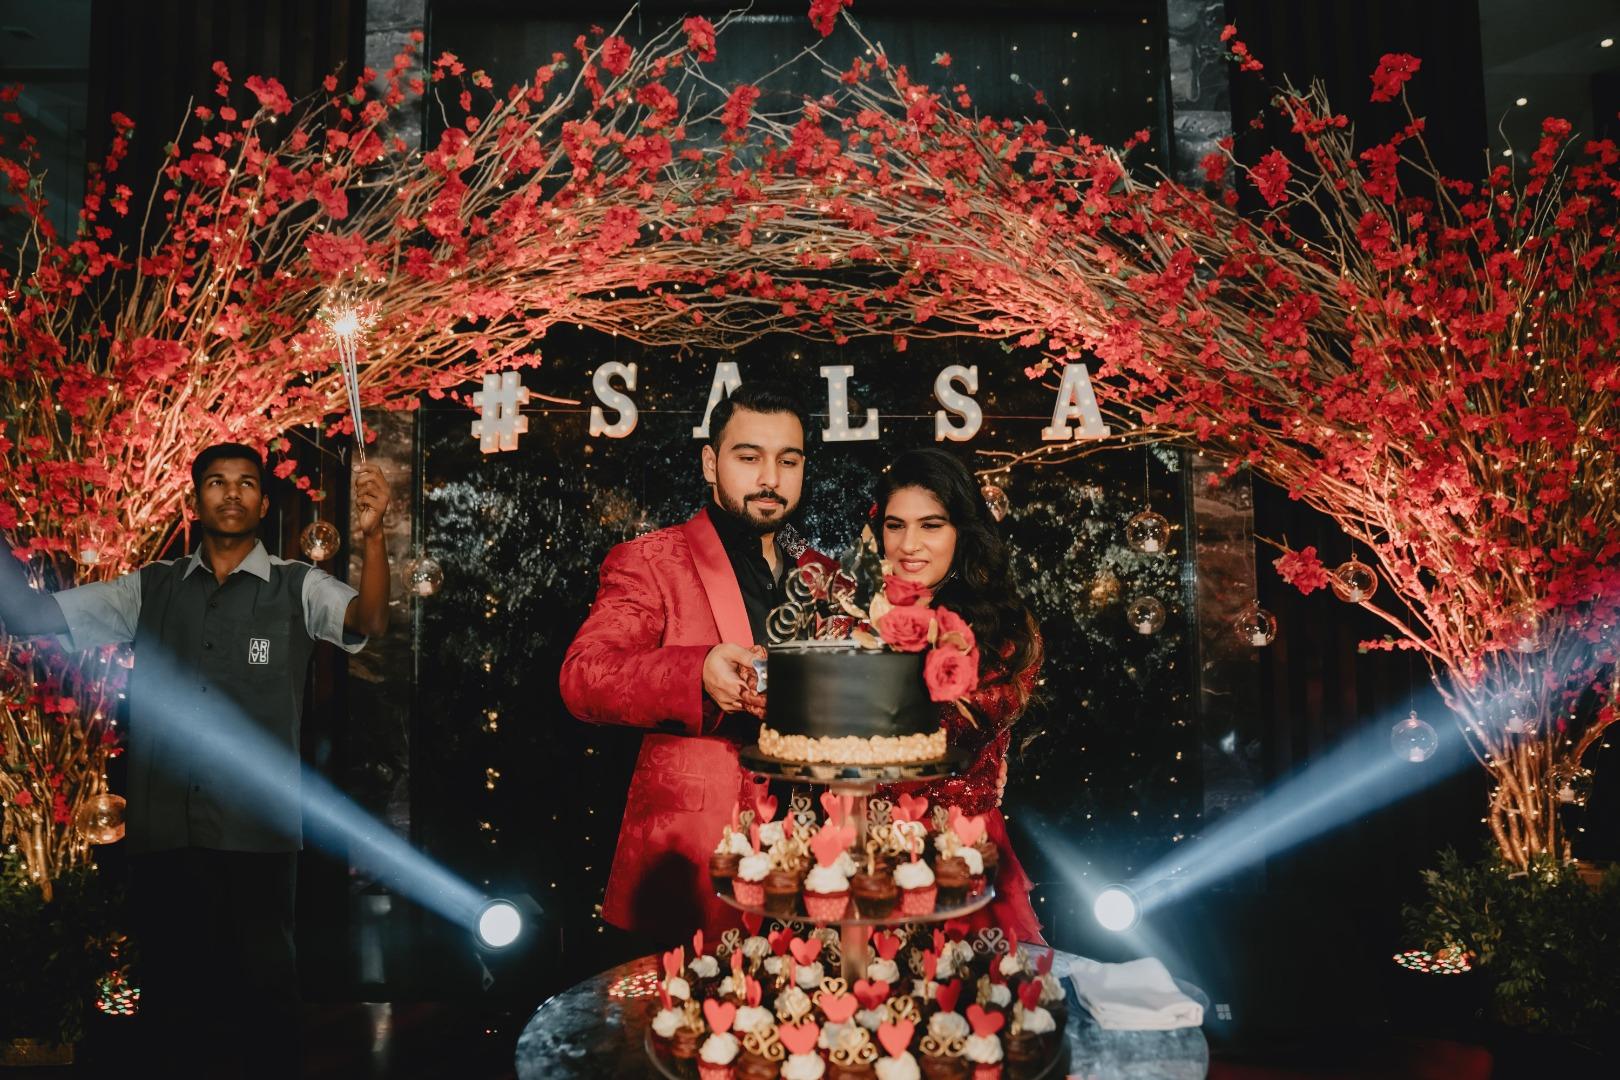 Indian Wedding Cake Cutting Ceremony